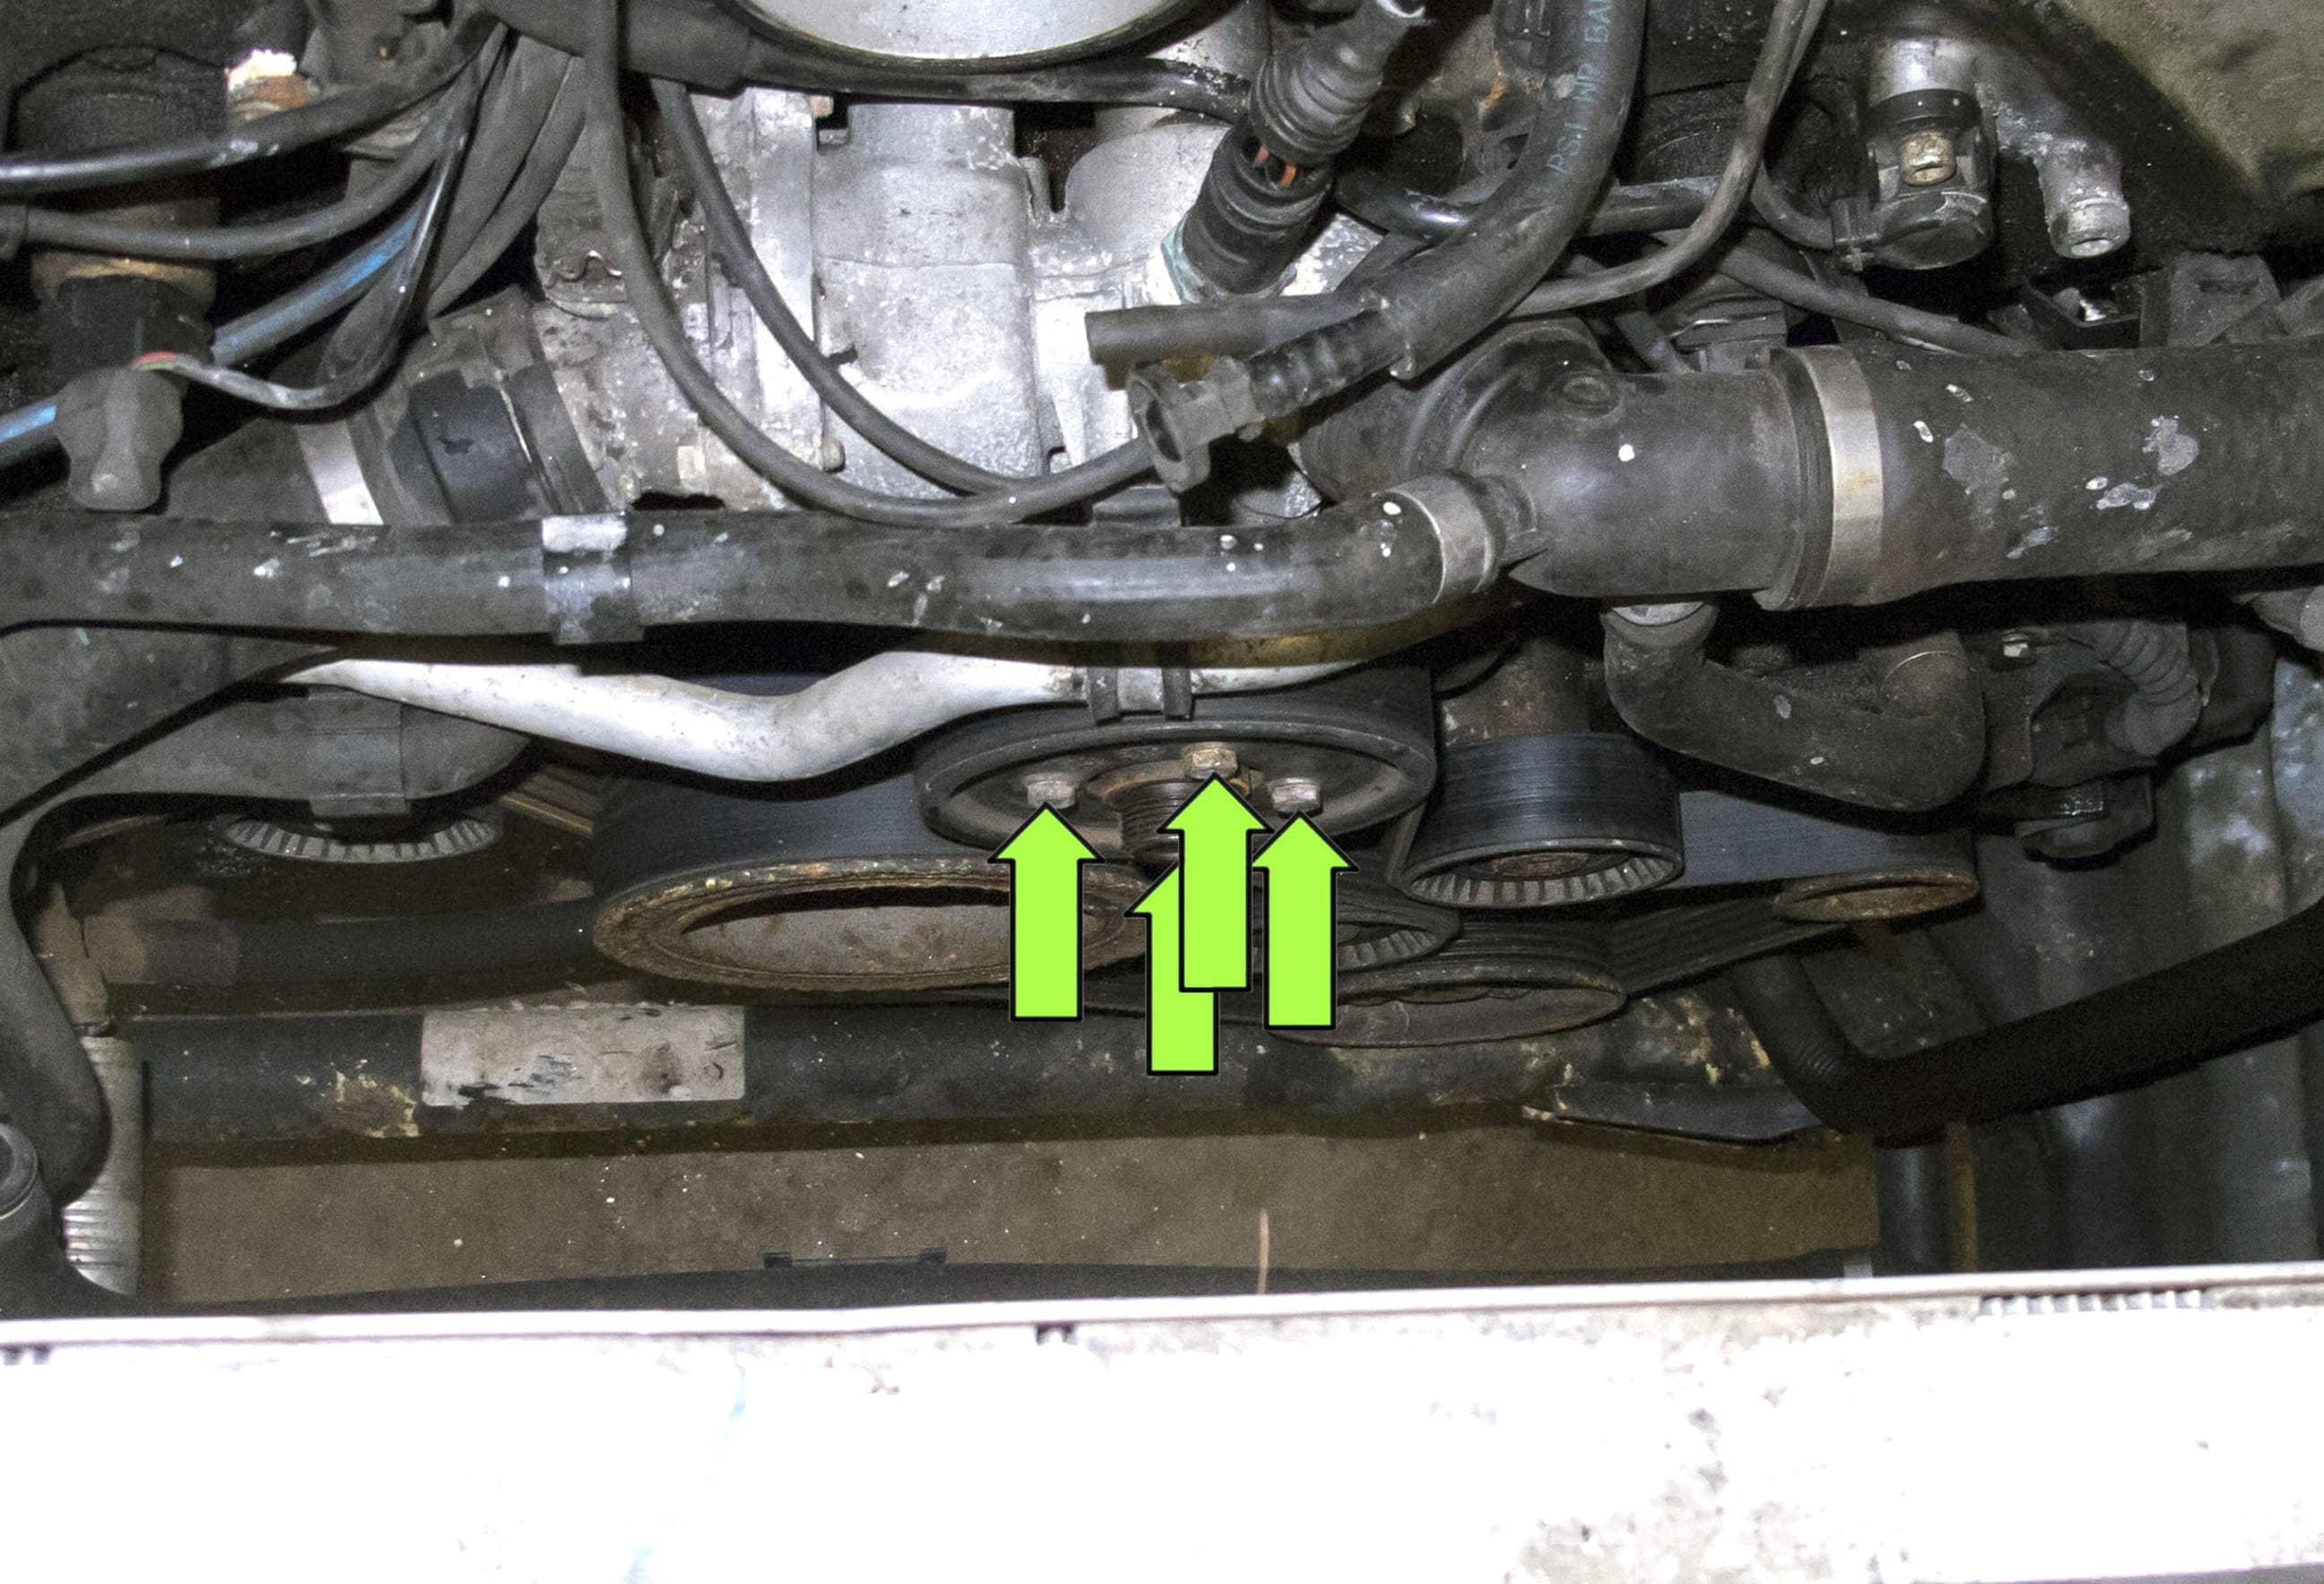 Mins Water Pump Ionizer N14 Ecm Wiring Diagram Gooding Id P 2567 Large Image Extra